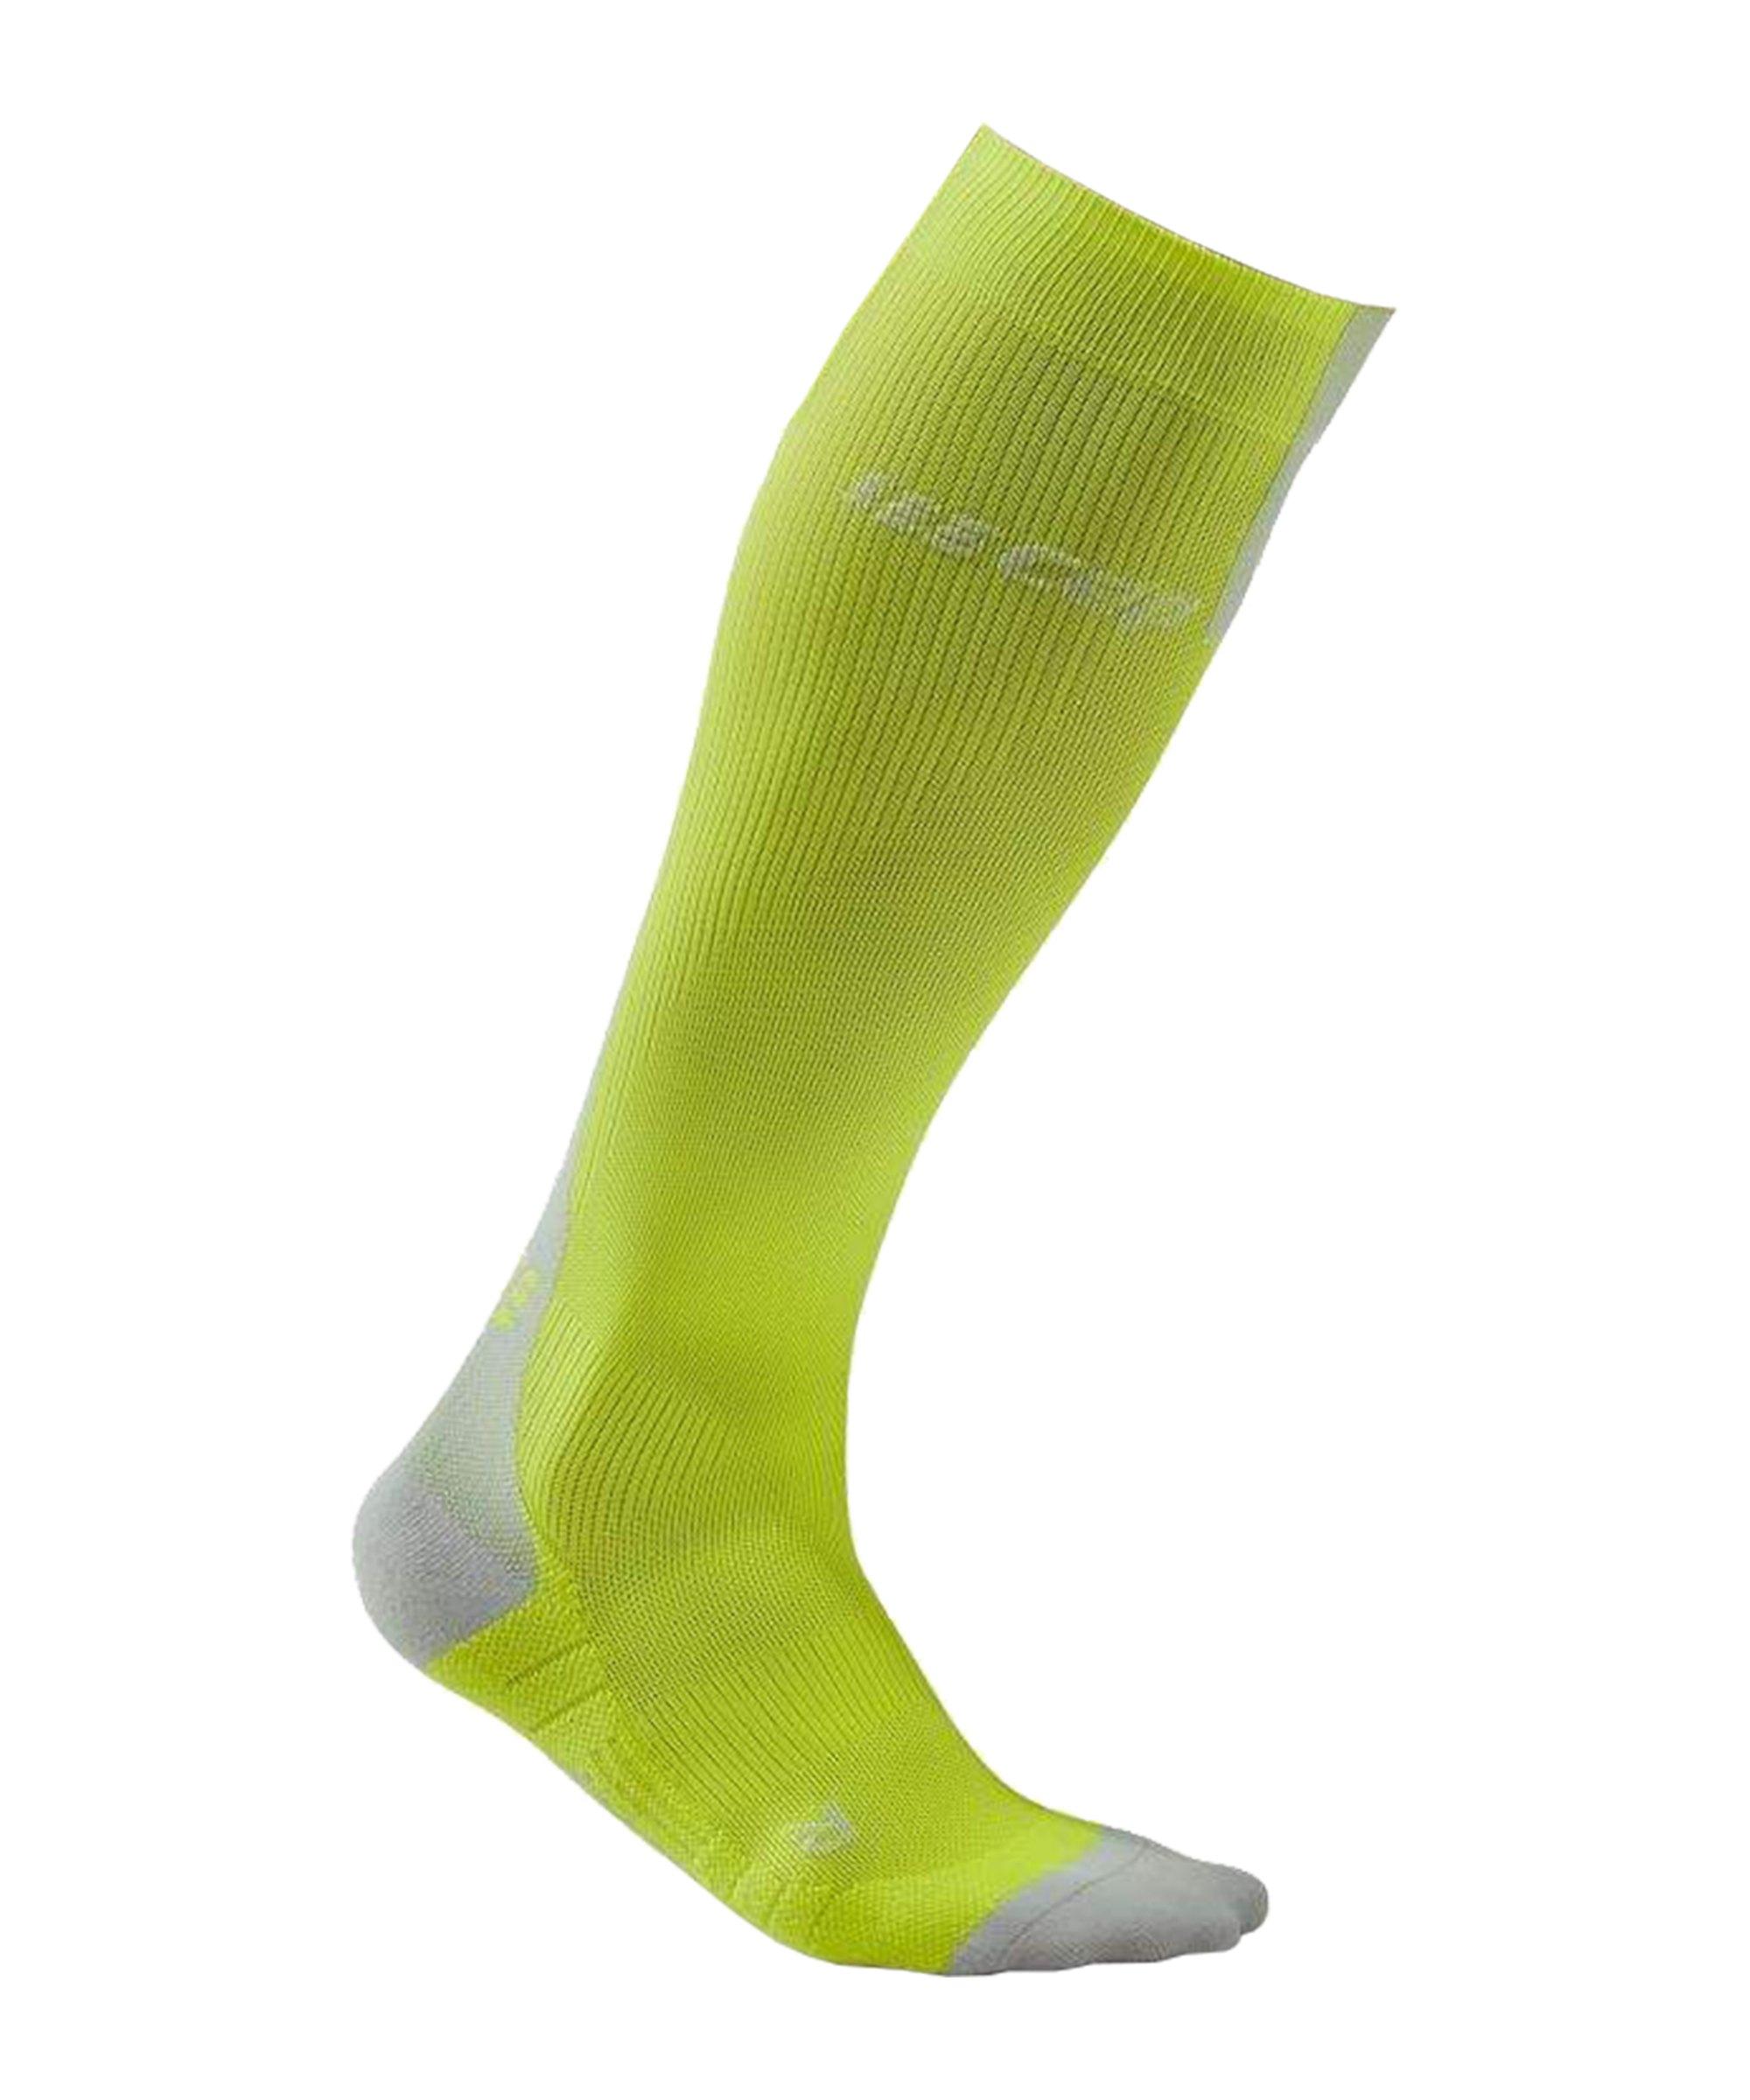 CEP Compressin 3.0 Socken Running Gelb Grau - gelb